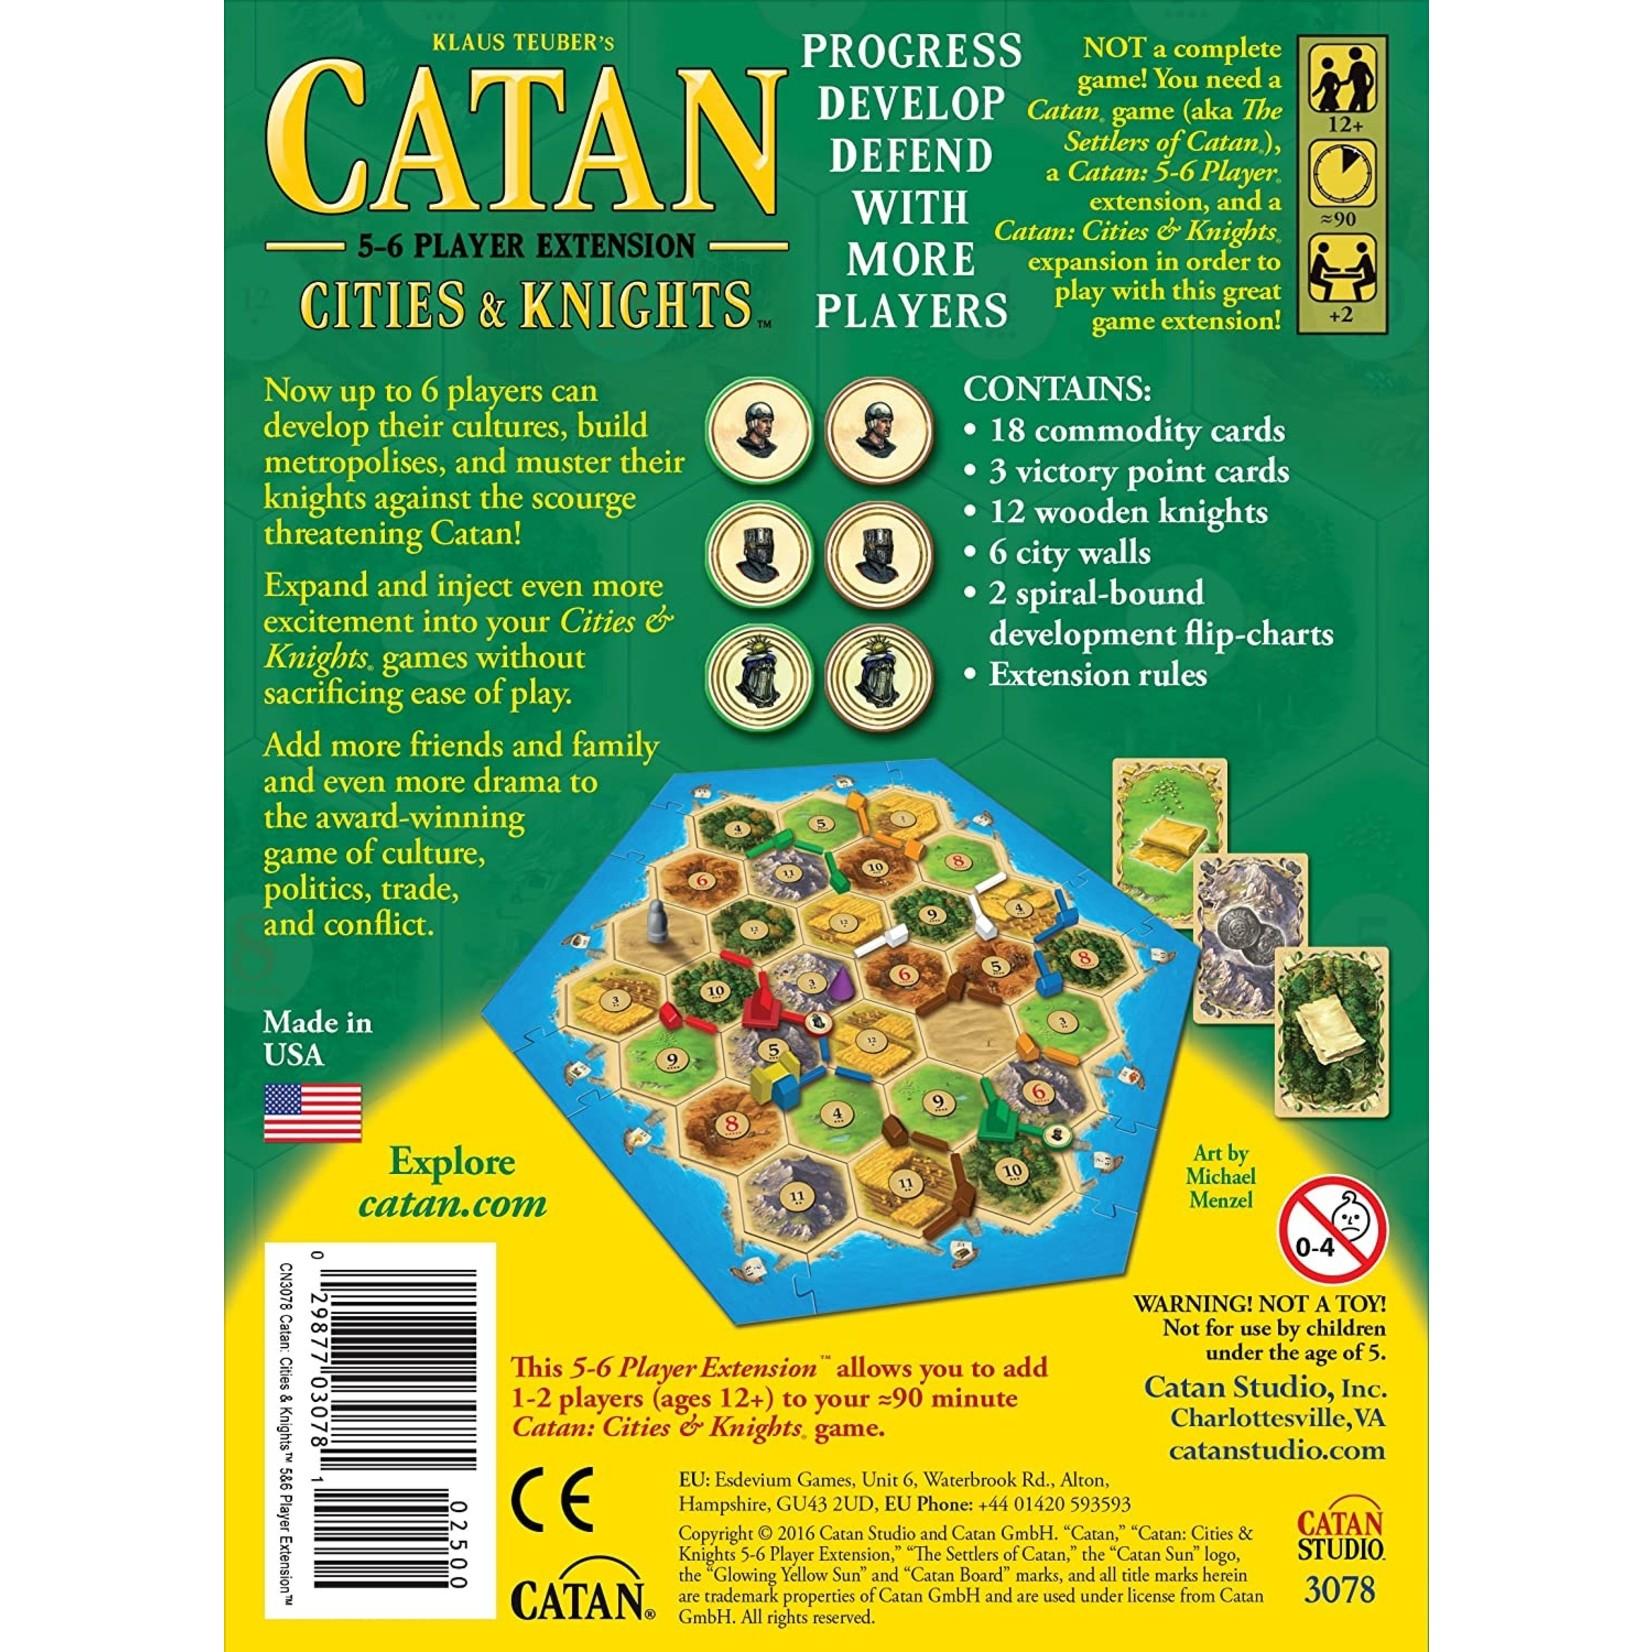 Catan Studios Inc. Catan: Cities & Knights 5-6 Player Extension